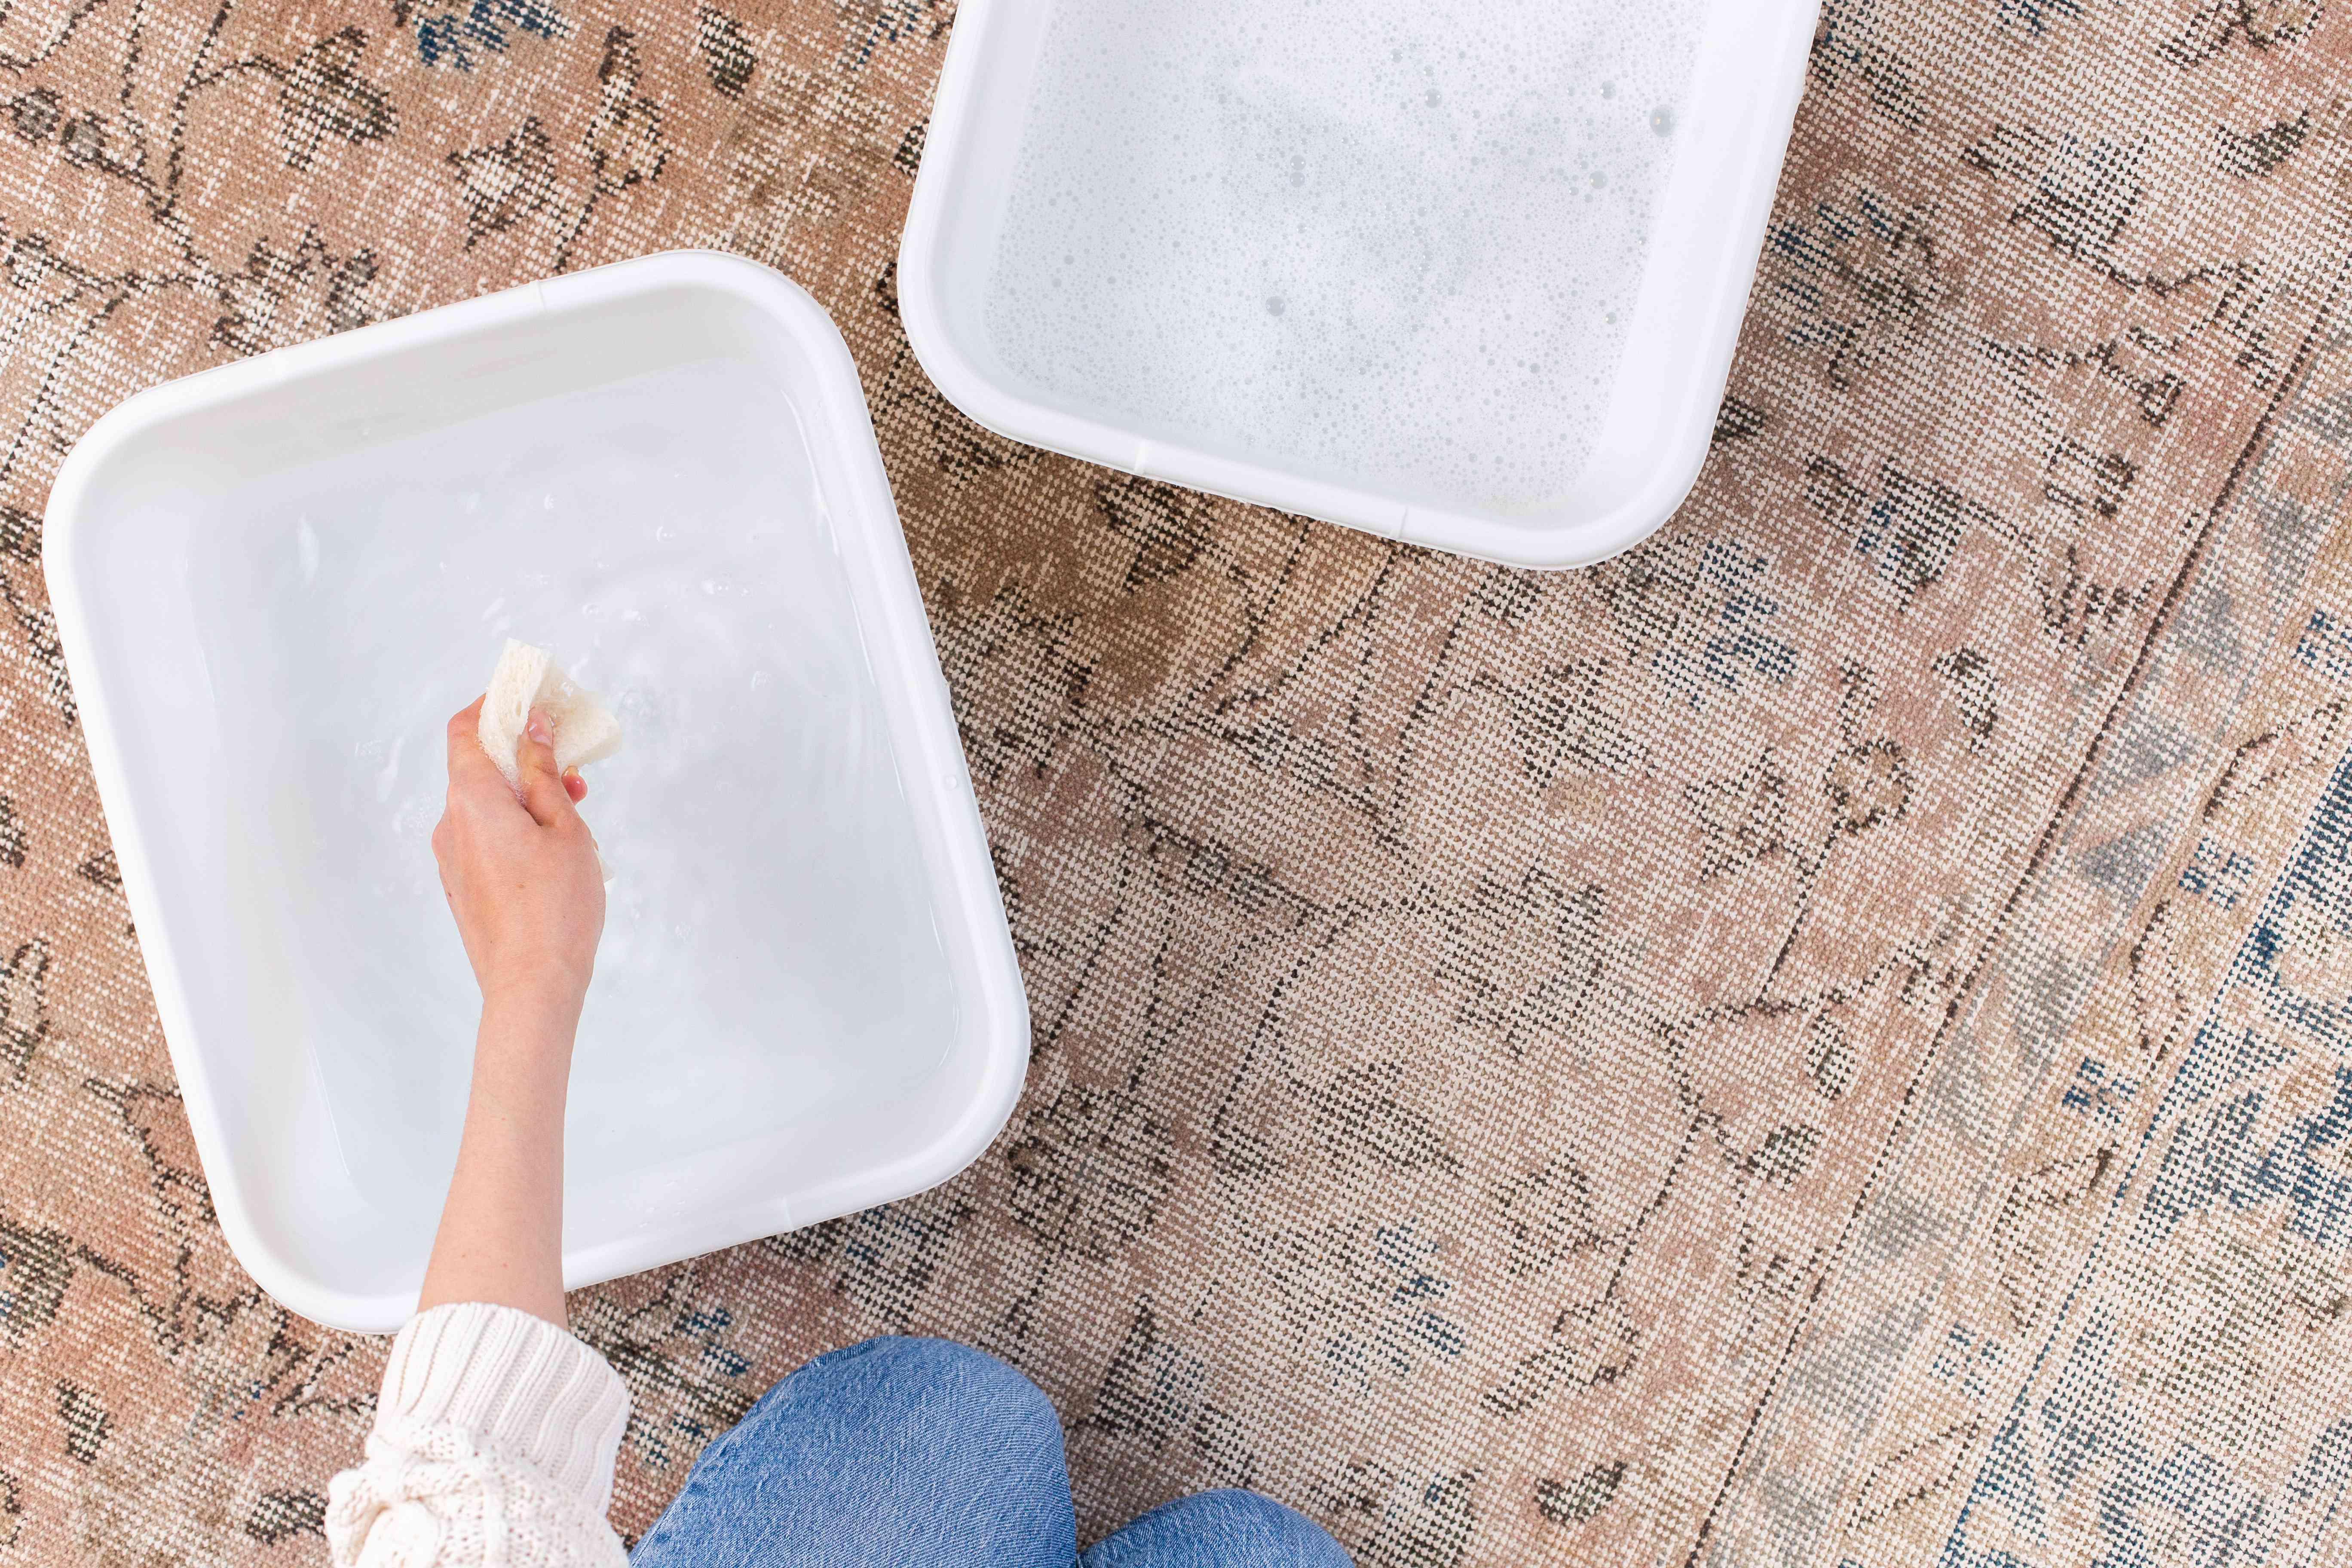 Sponge dipped in separate bucket of fresh water to rinse suds